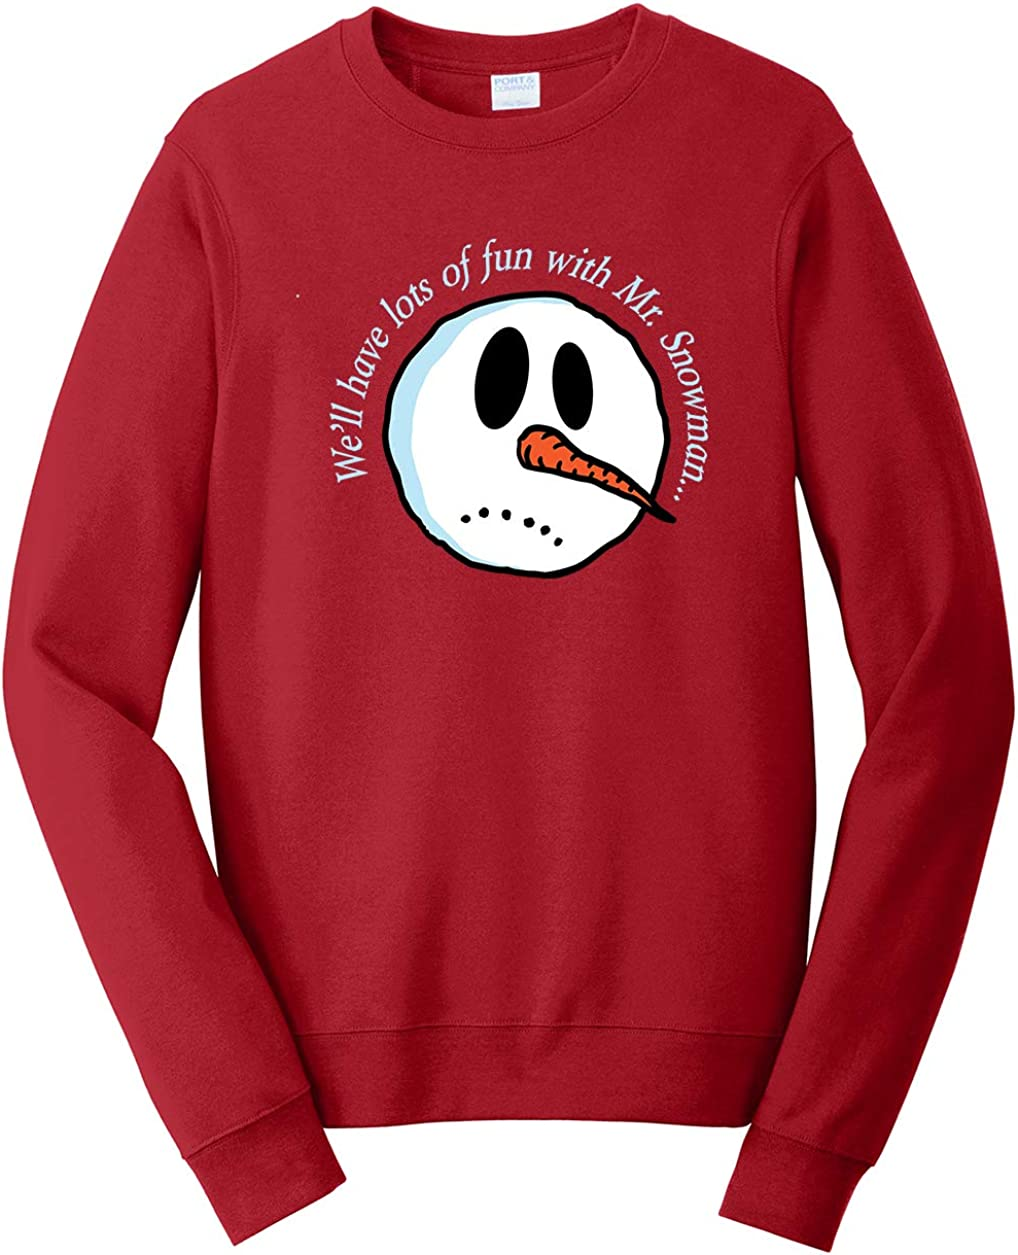 Snowman Sweatshirt Tenacitee Unisex Lots of Fun with Mr